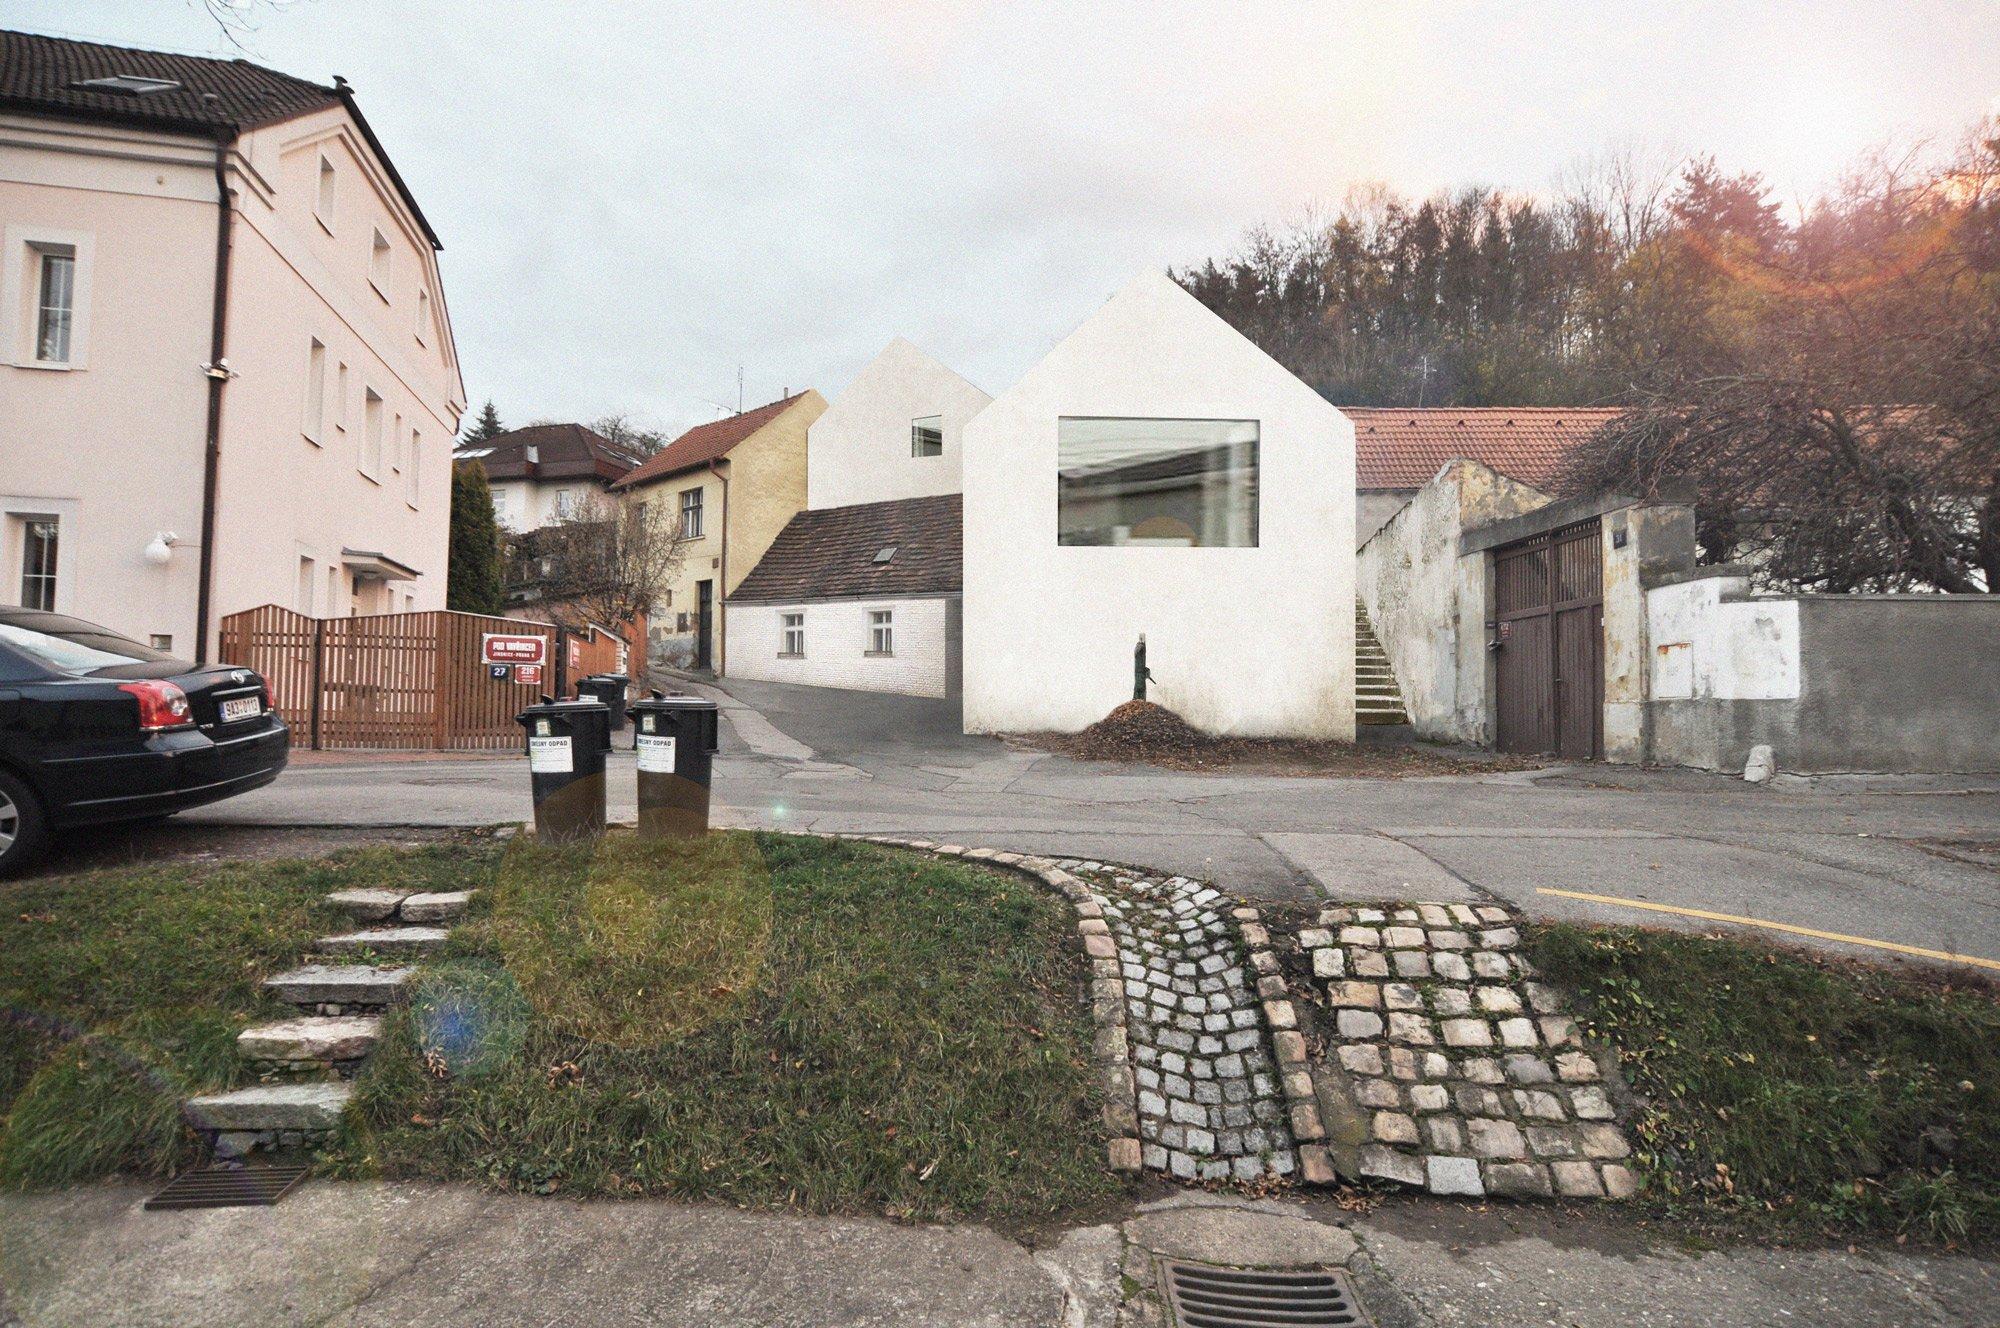 Concept © Atelier 111 architekti